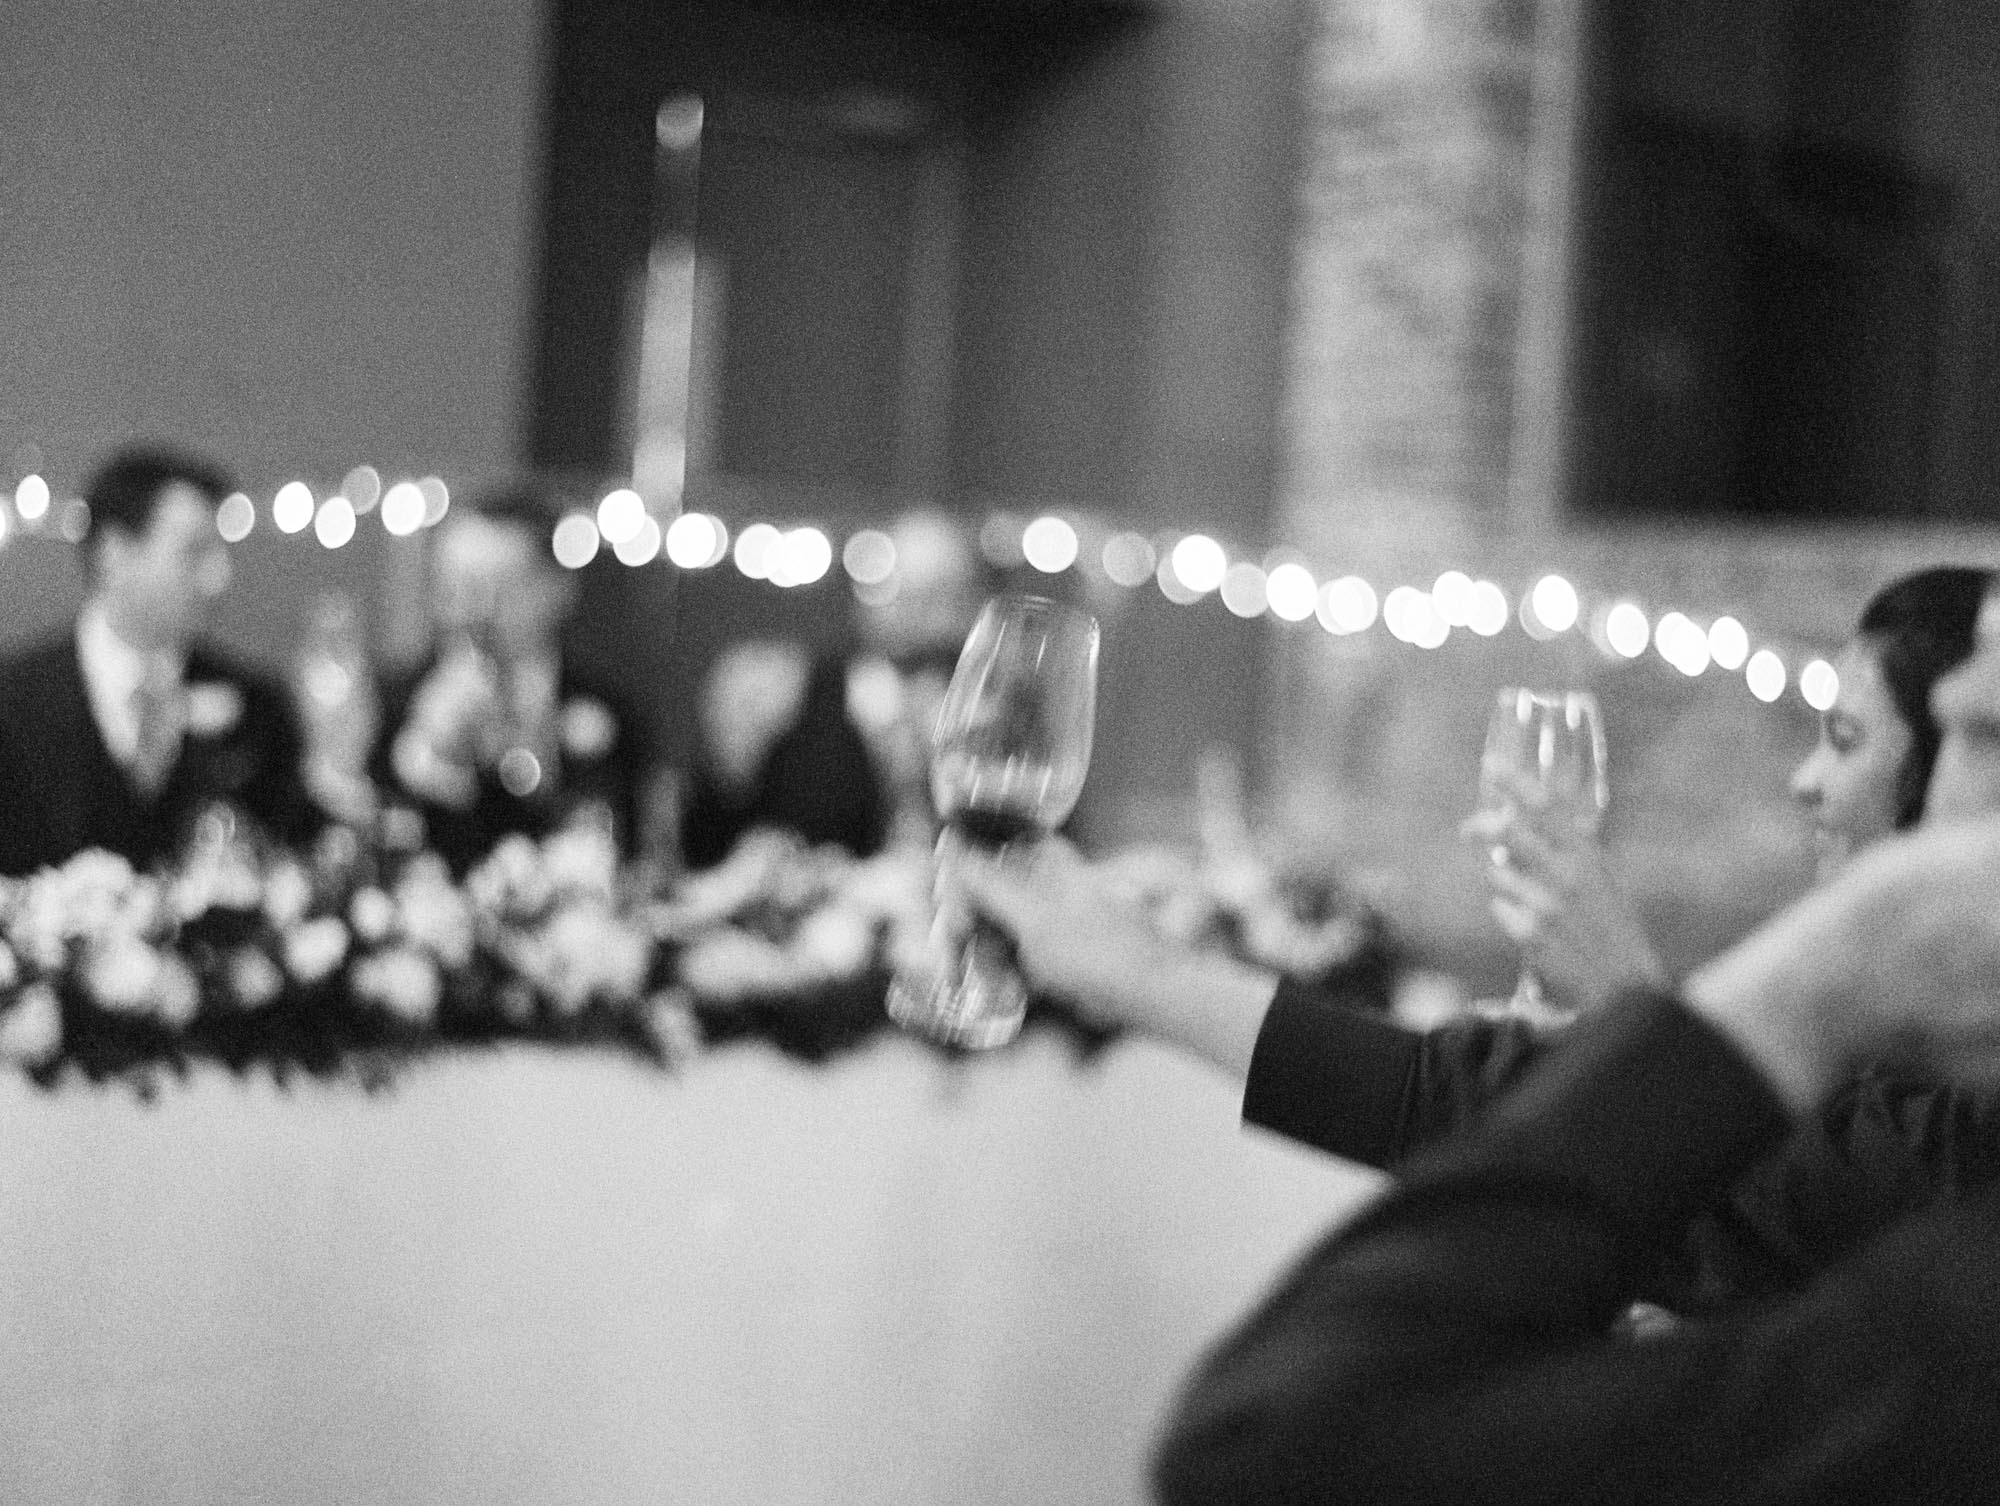 Glen-Ewin-Estate-wedding-photography-095.jpg